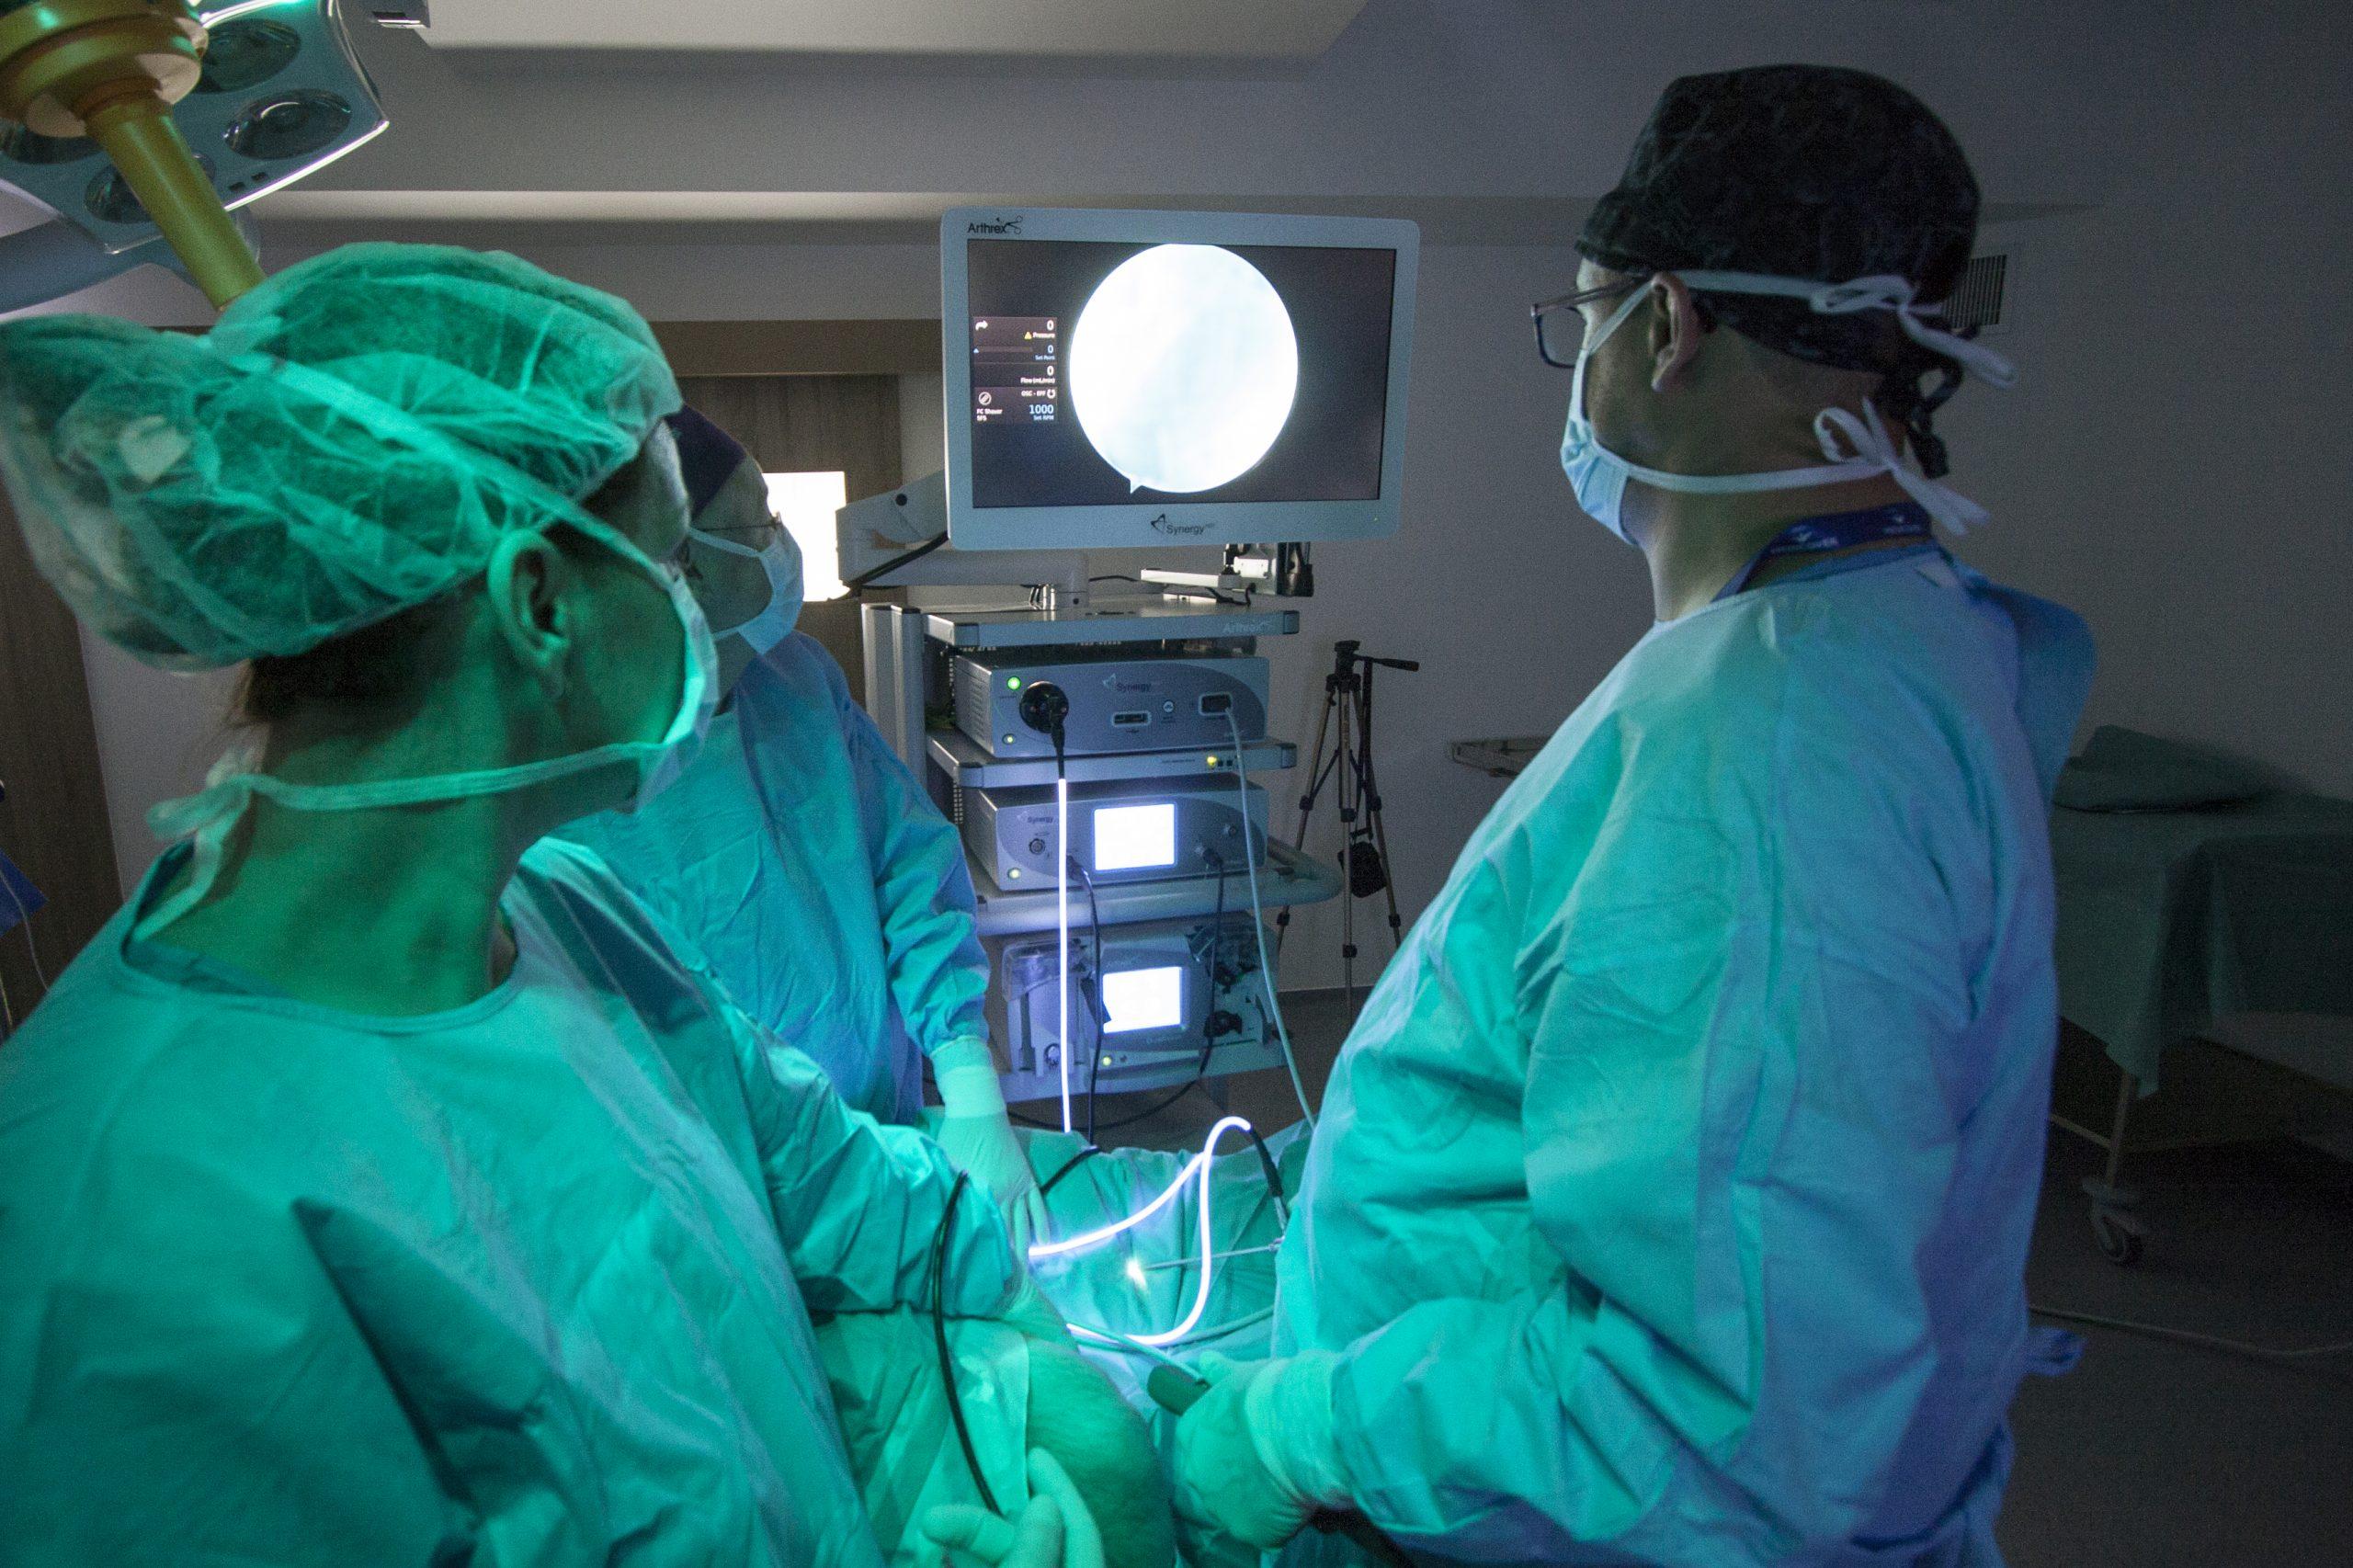 Endoscopic Sinus Surgery Fess Mysurgeryabroad Medicover Hospital Hospital Abroad Affordable Surgery In Budapest Hungary